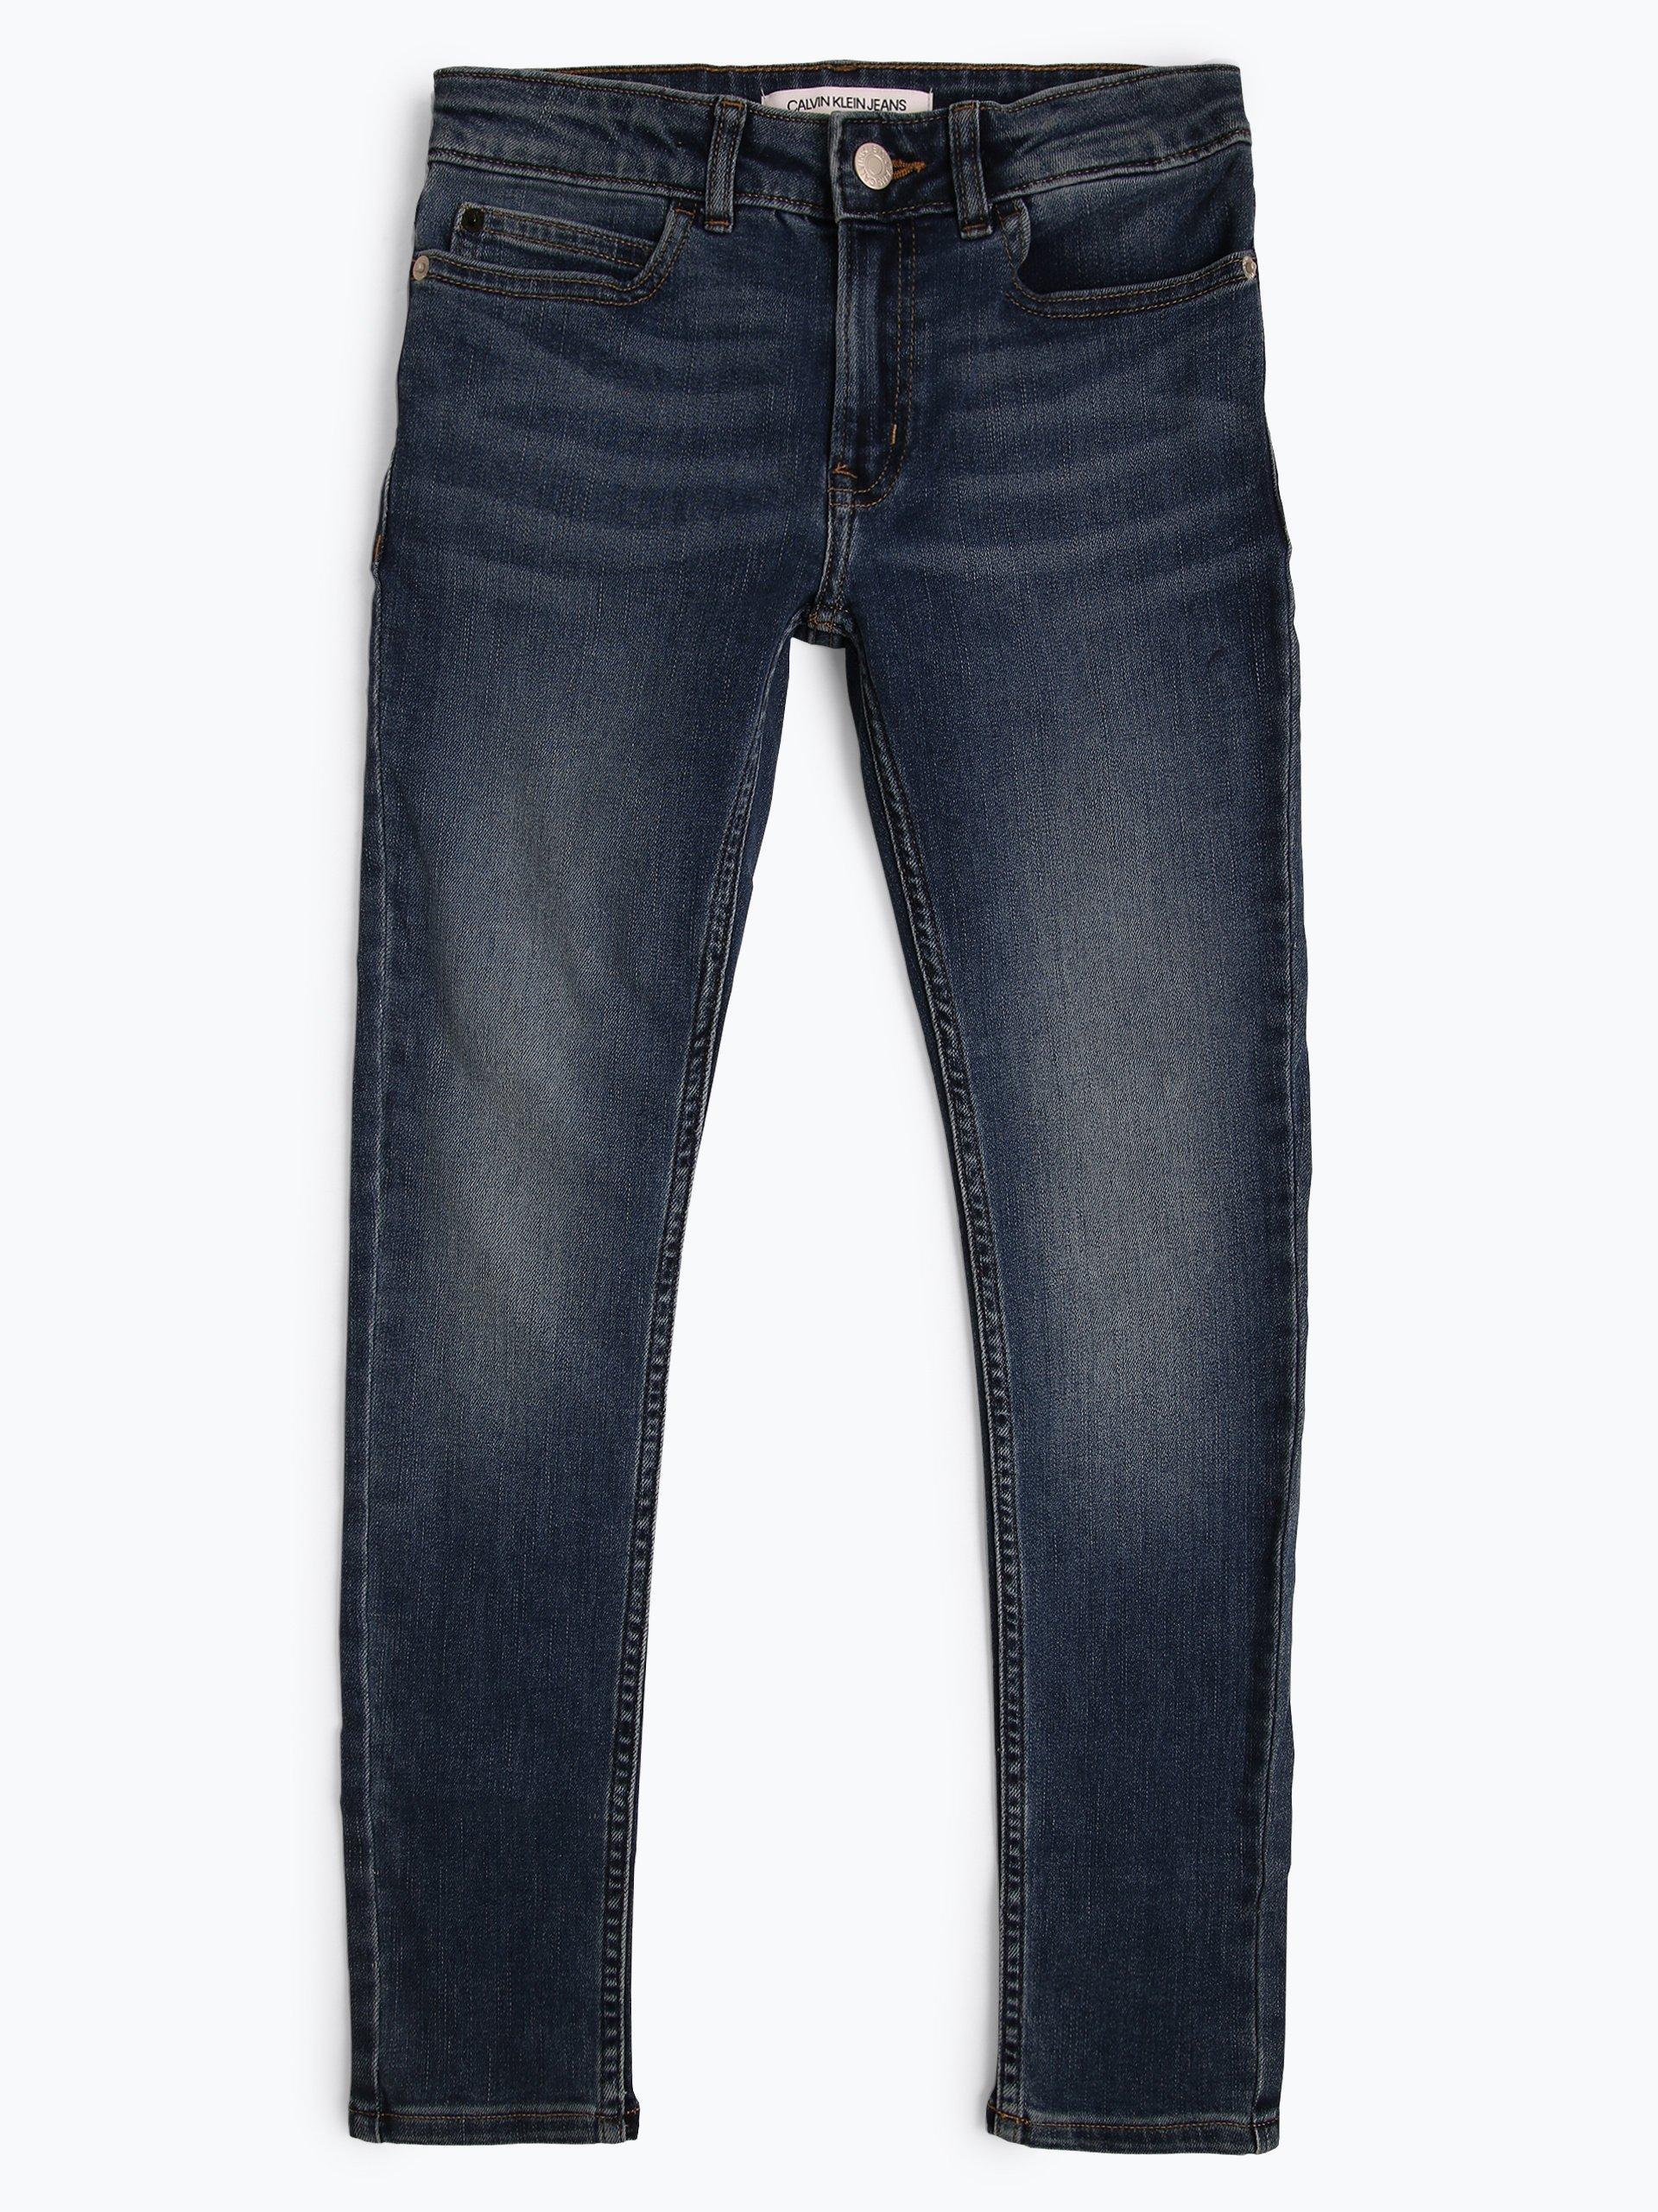 Calvin Klein Jeans Mädchen Jeans Skinny Fit